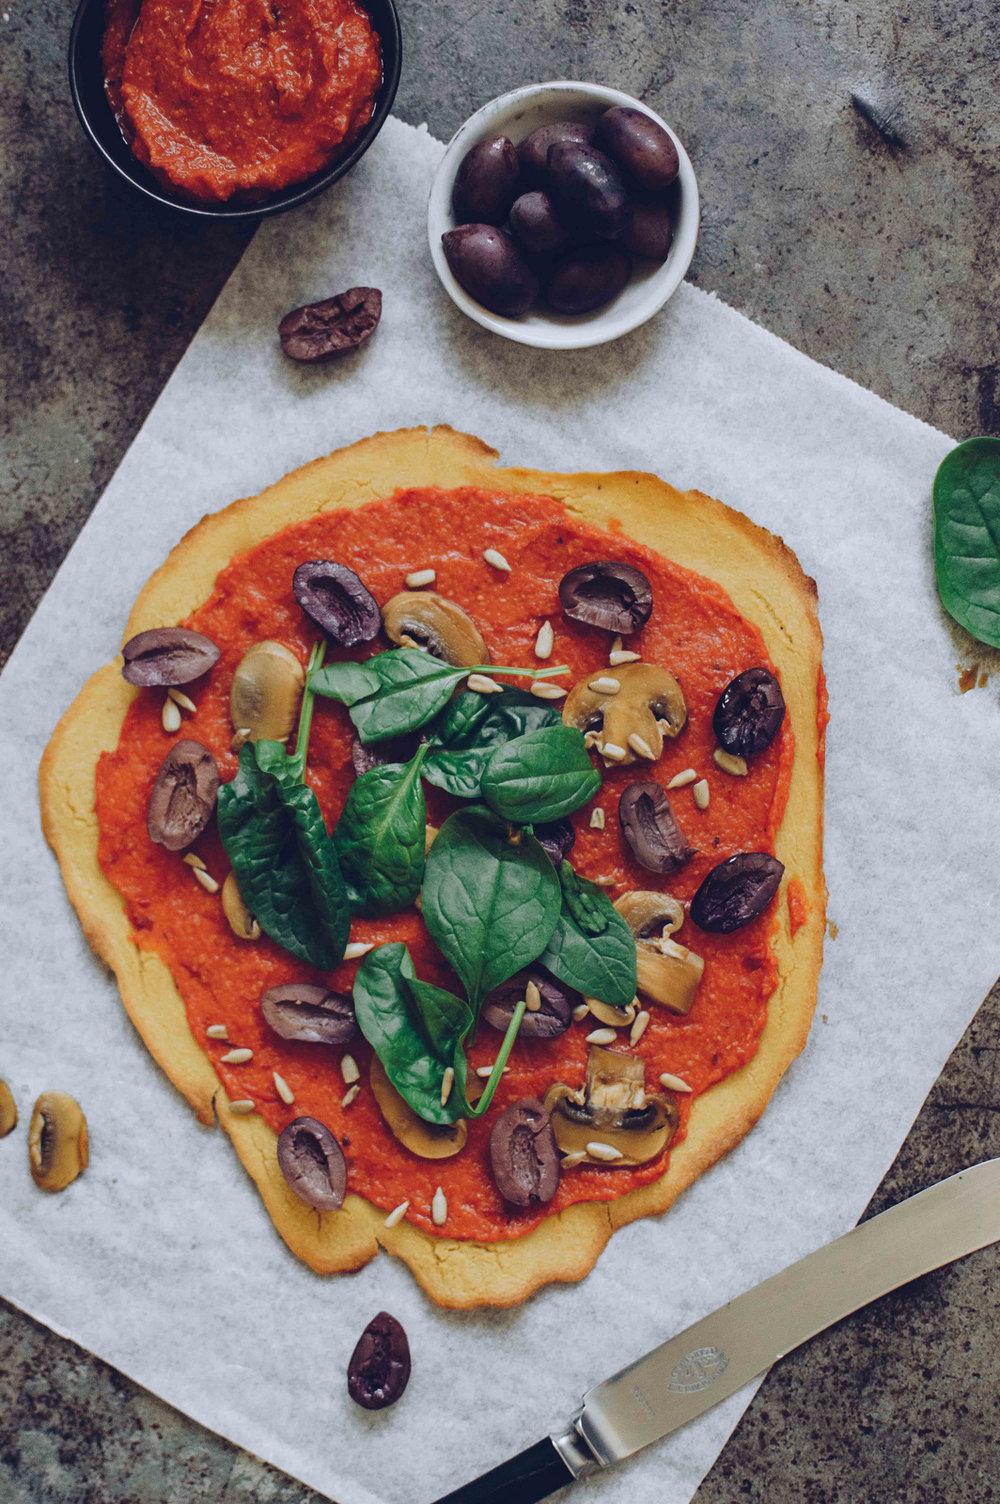 Socca披萨与3d太湖字谜总汇蔓延和塔希尼蘑菇|北欧厨房